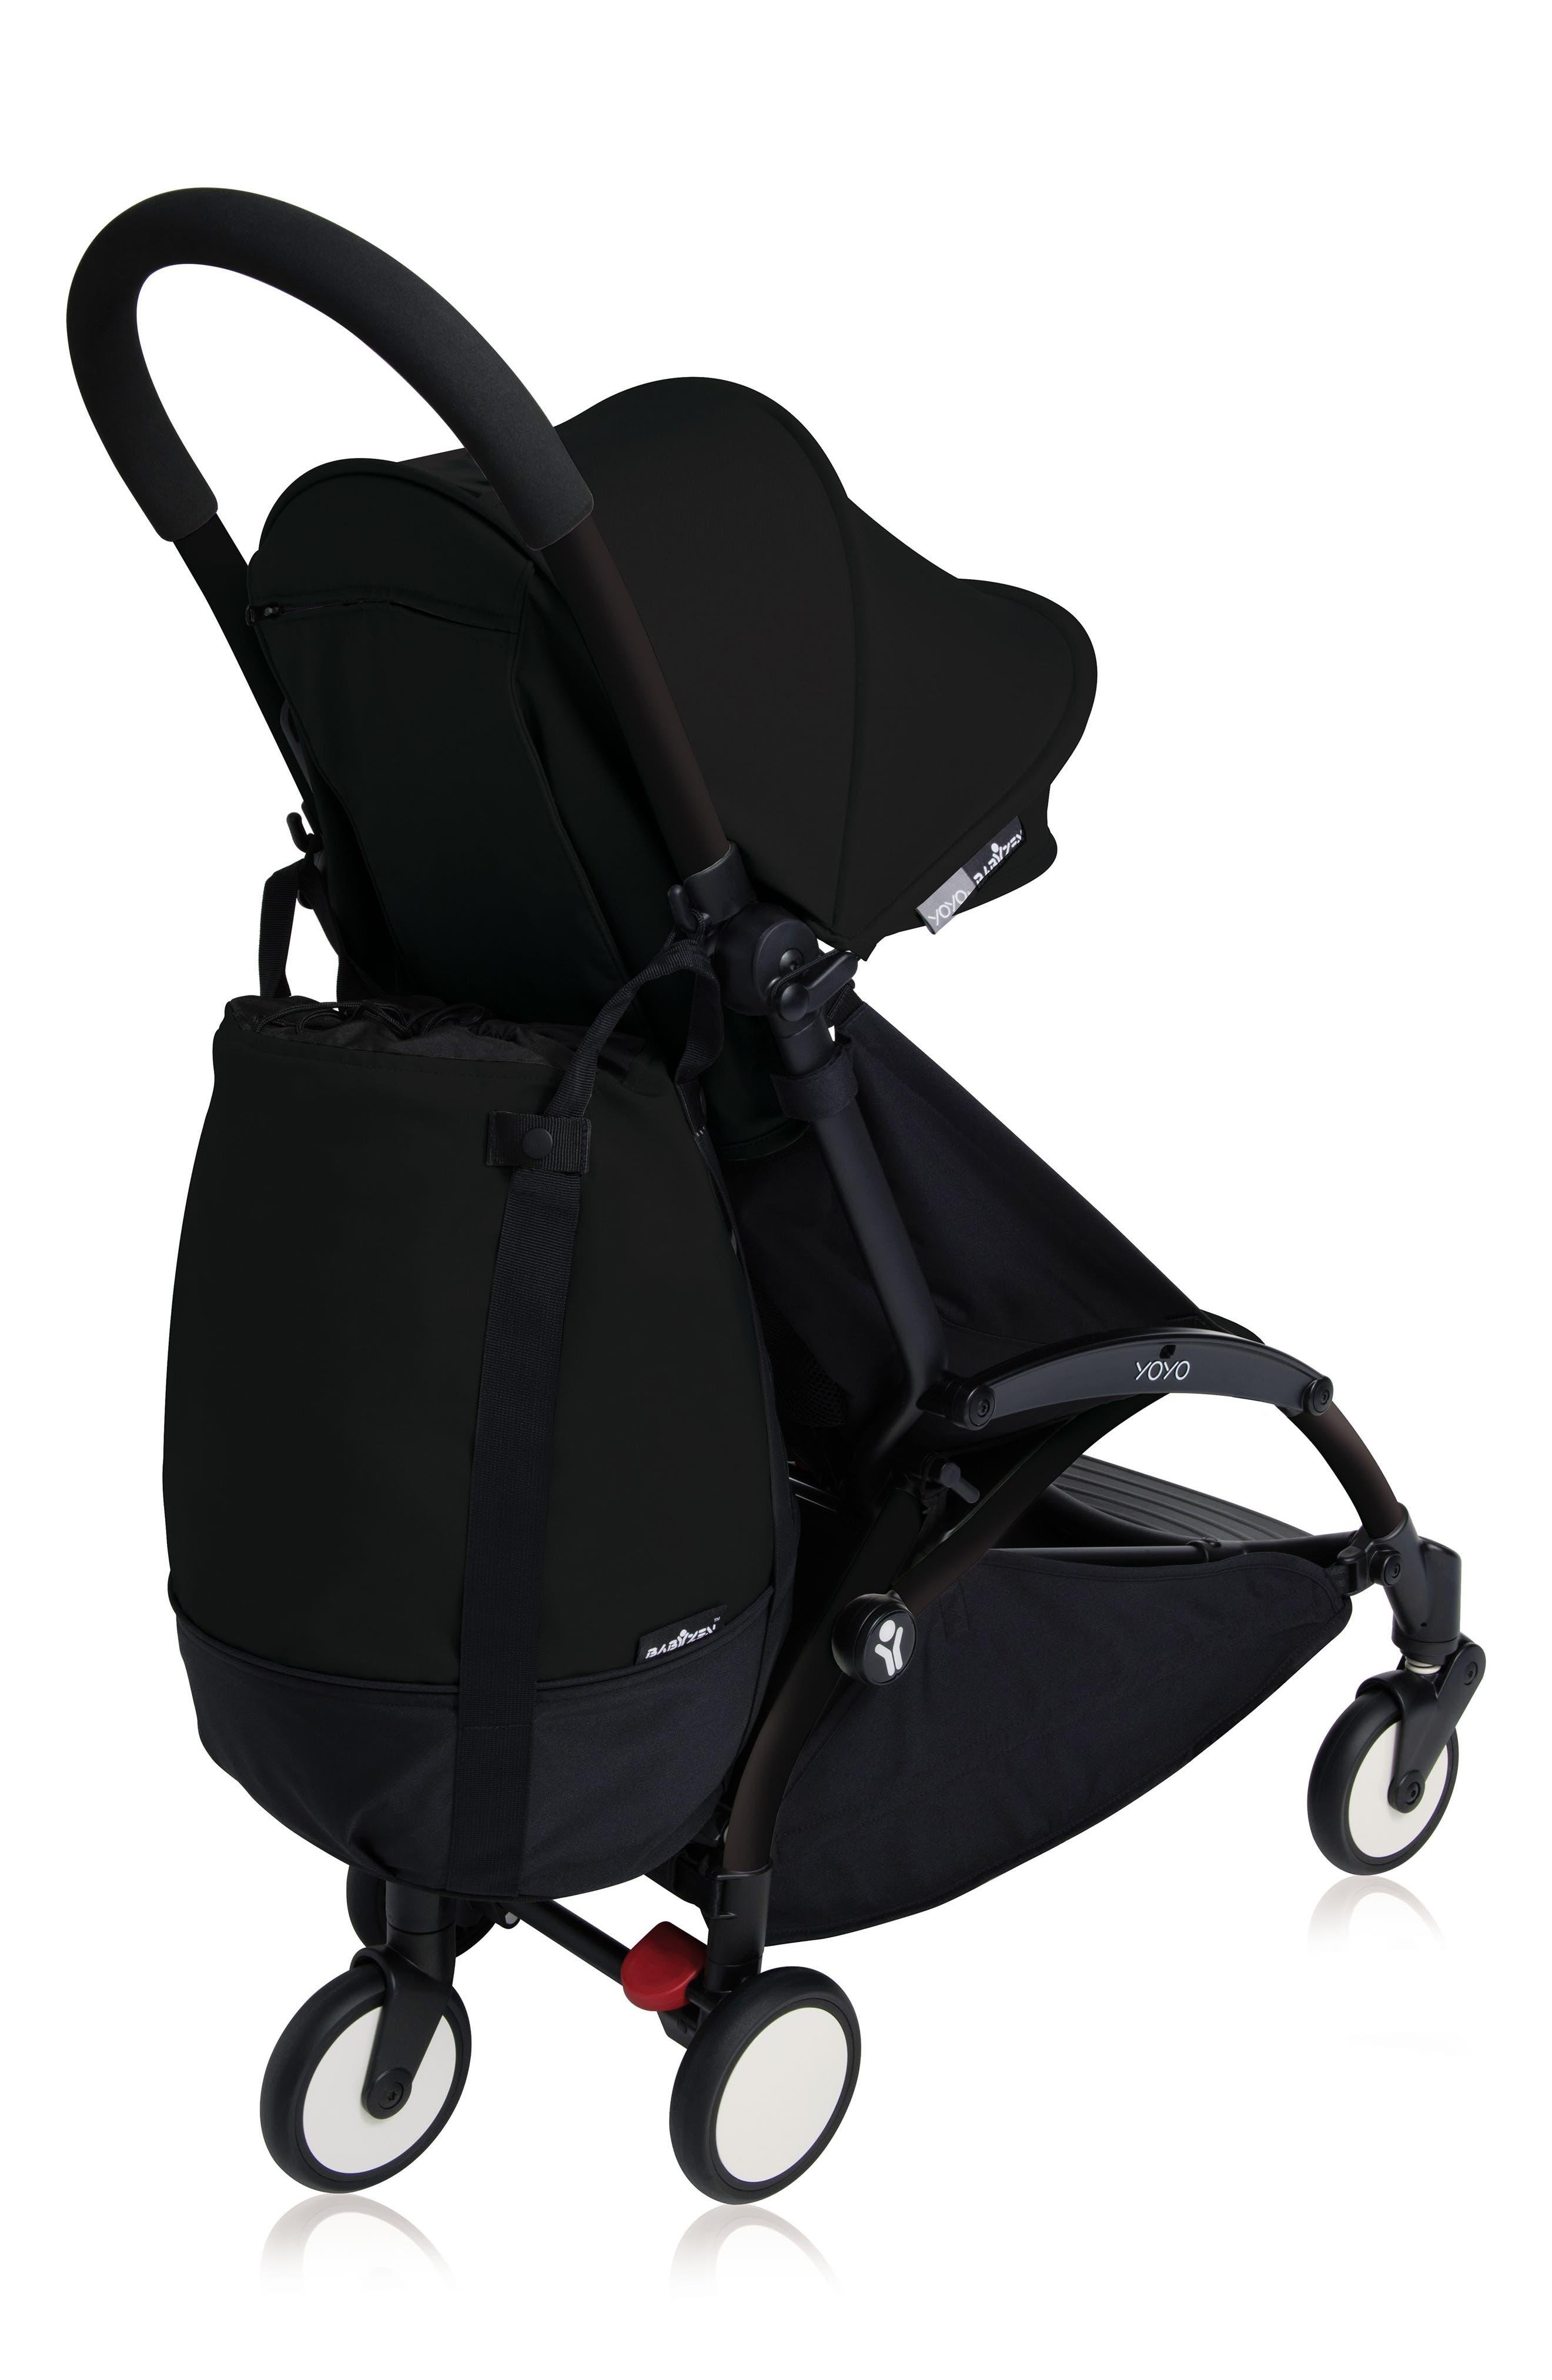 Infant Babyzen(TM) Yoyo Rolling Stroller Bag Size One Size  Black